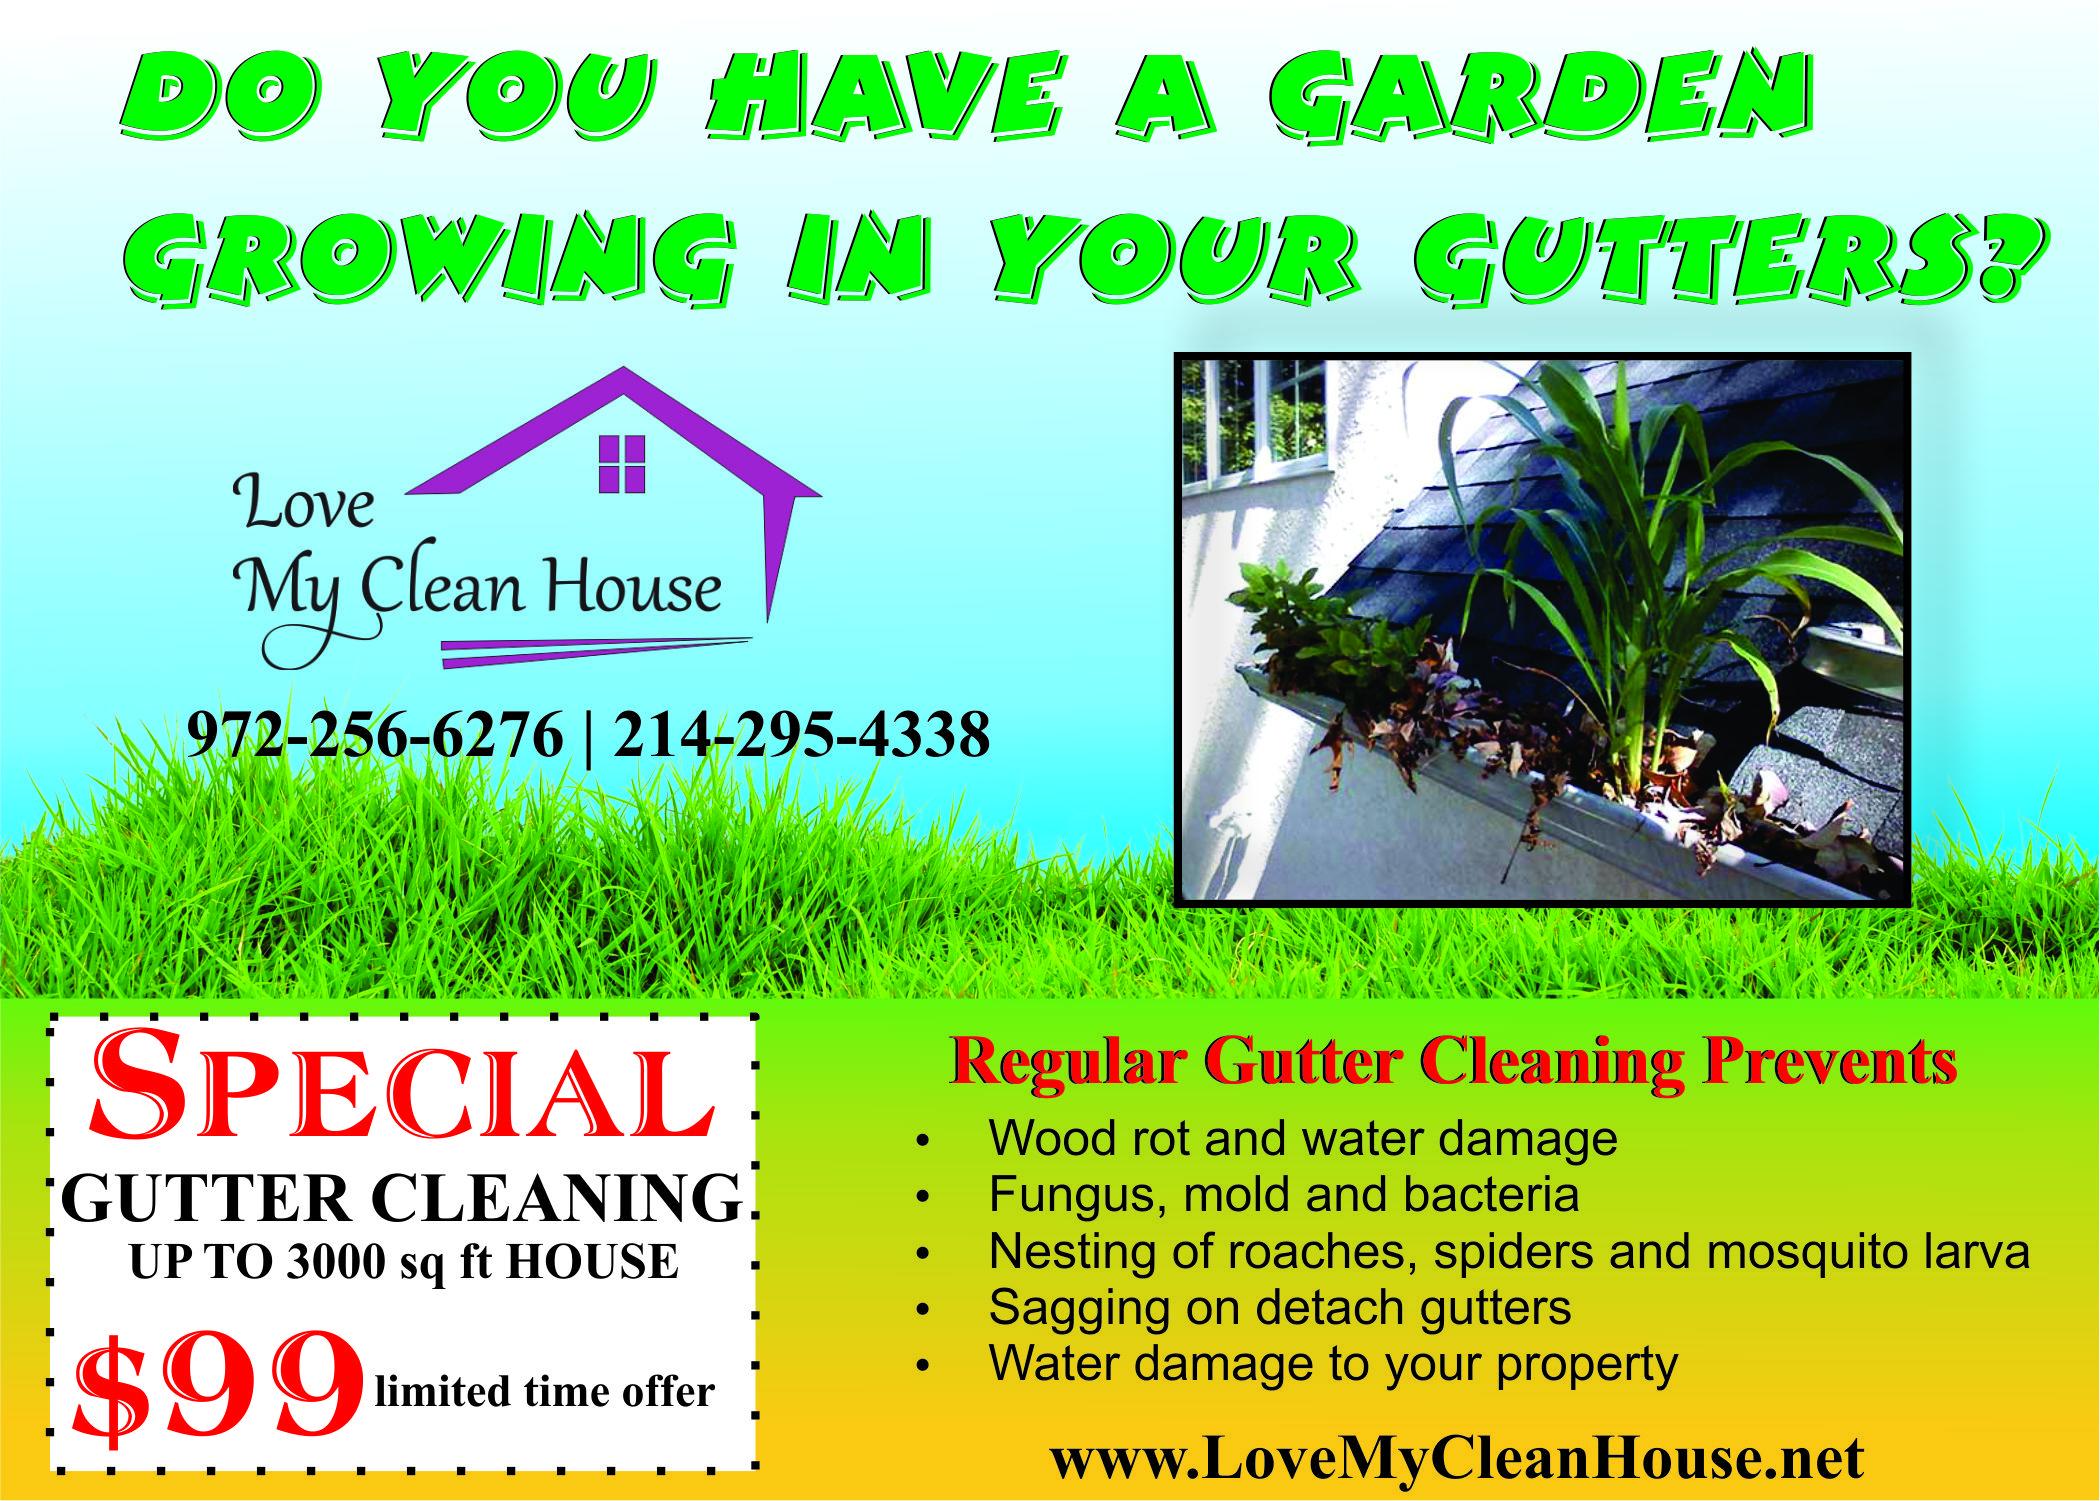 www.lovemycleanhouse.net – House Cleaning in McKinney, Plano, Frisco ...